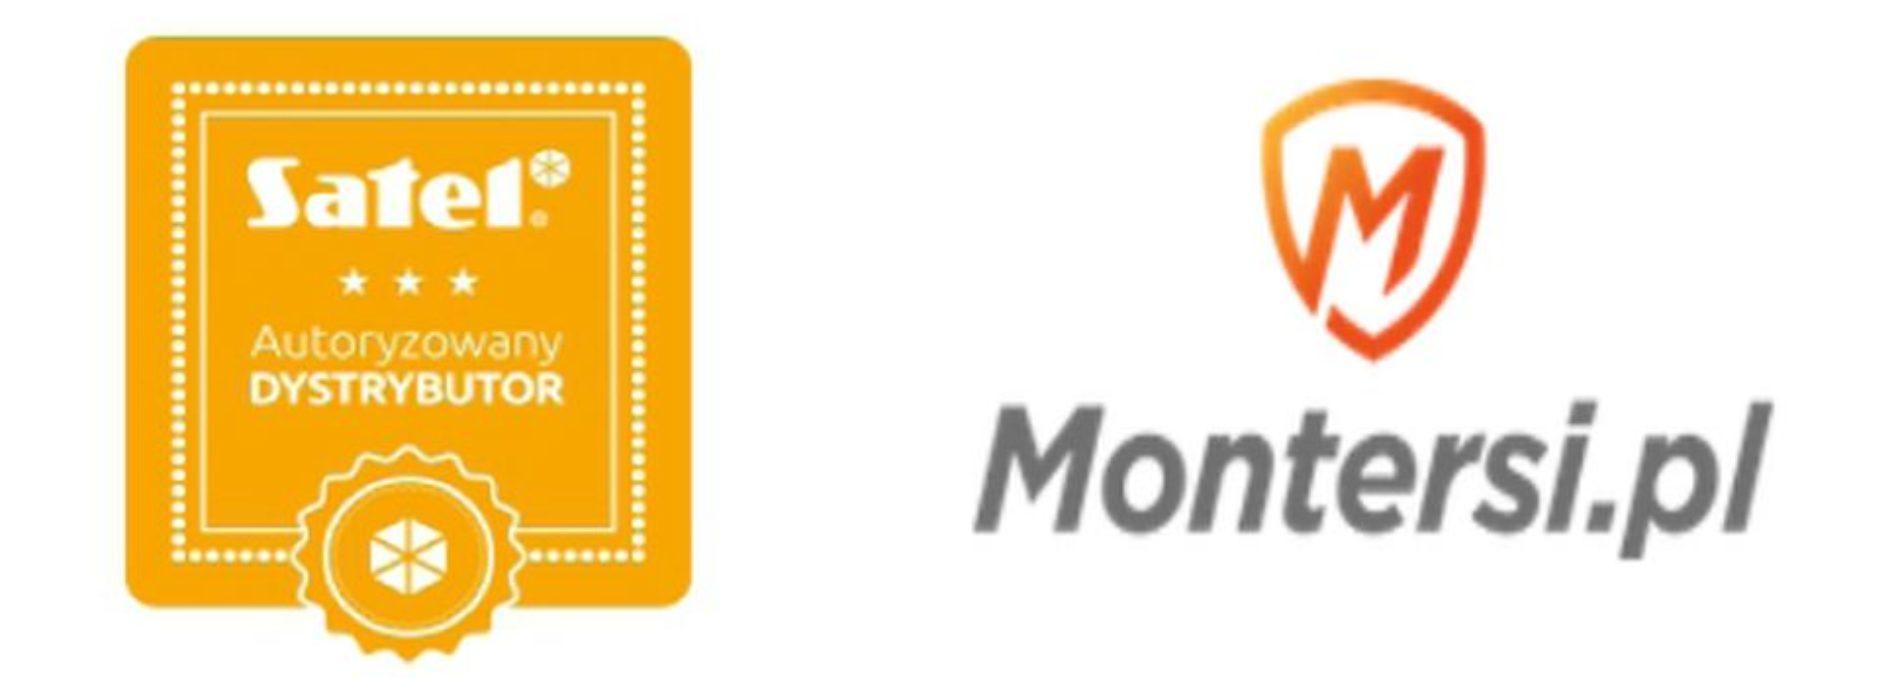 Montersi i Satel – kurs na wspólną jakość